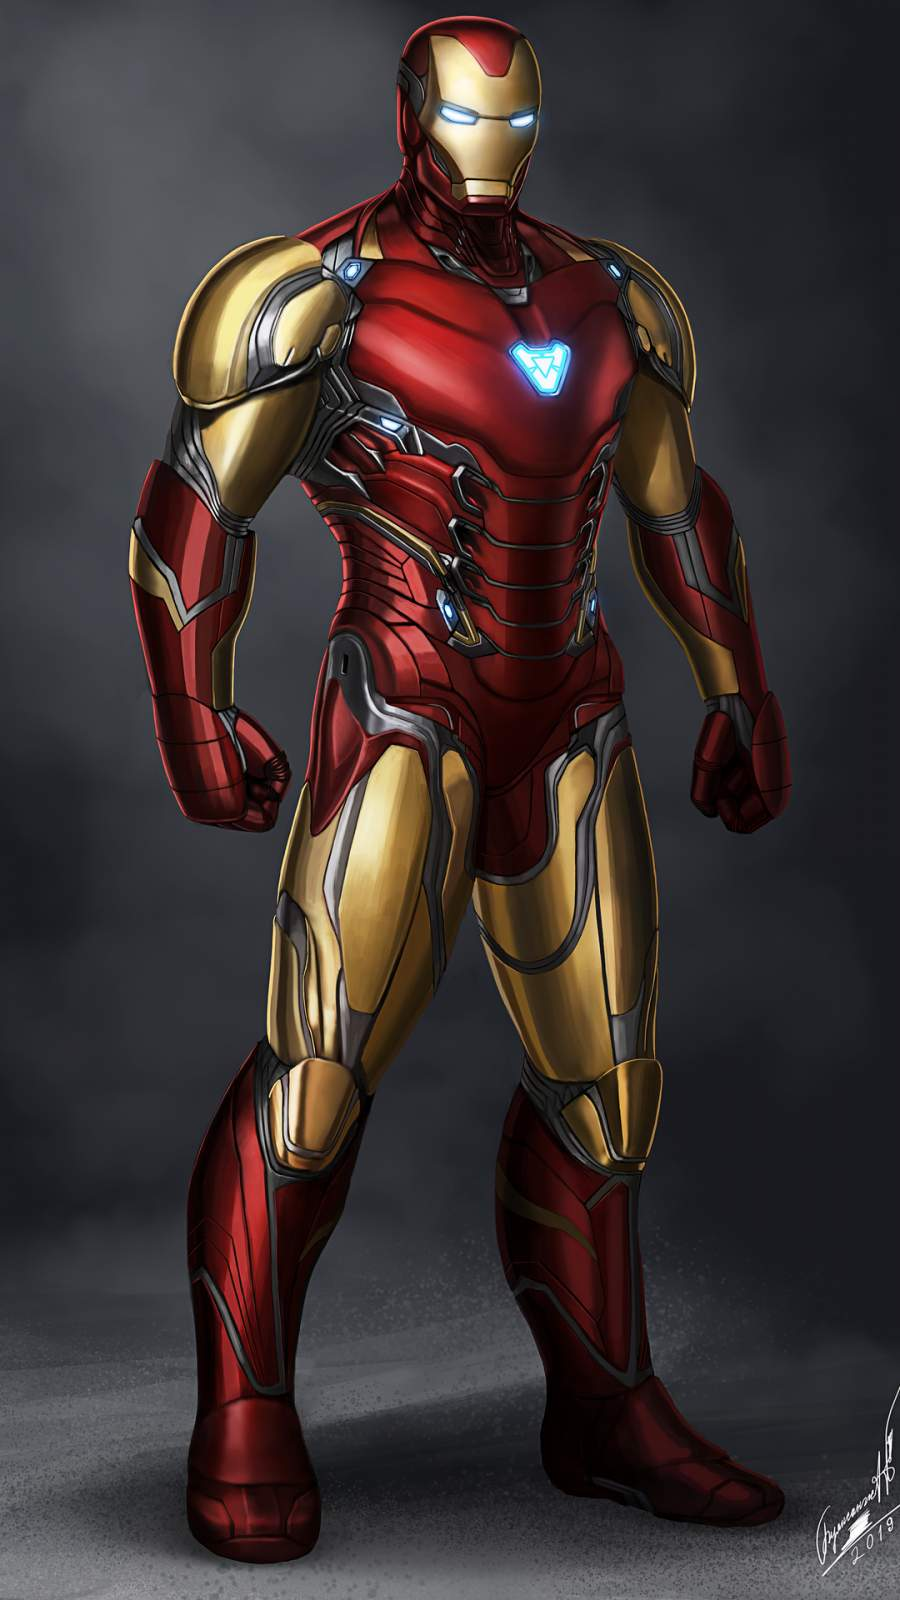 Iron Man Mark 85 4K iPhone Wallpaper